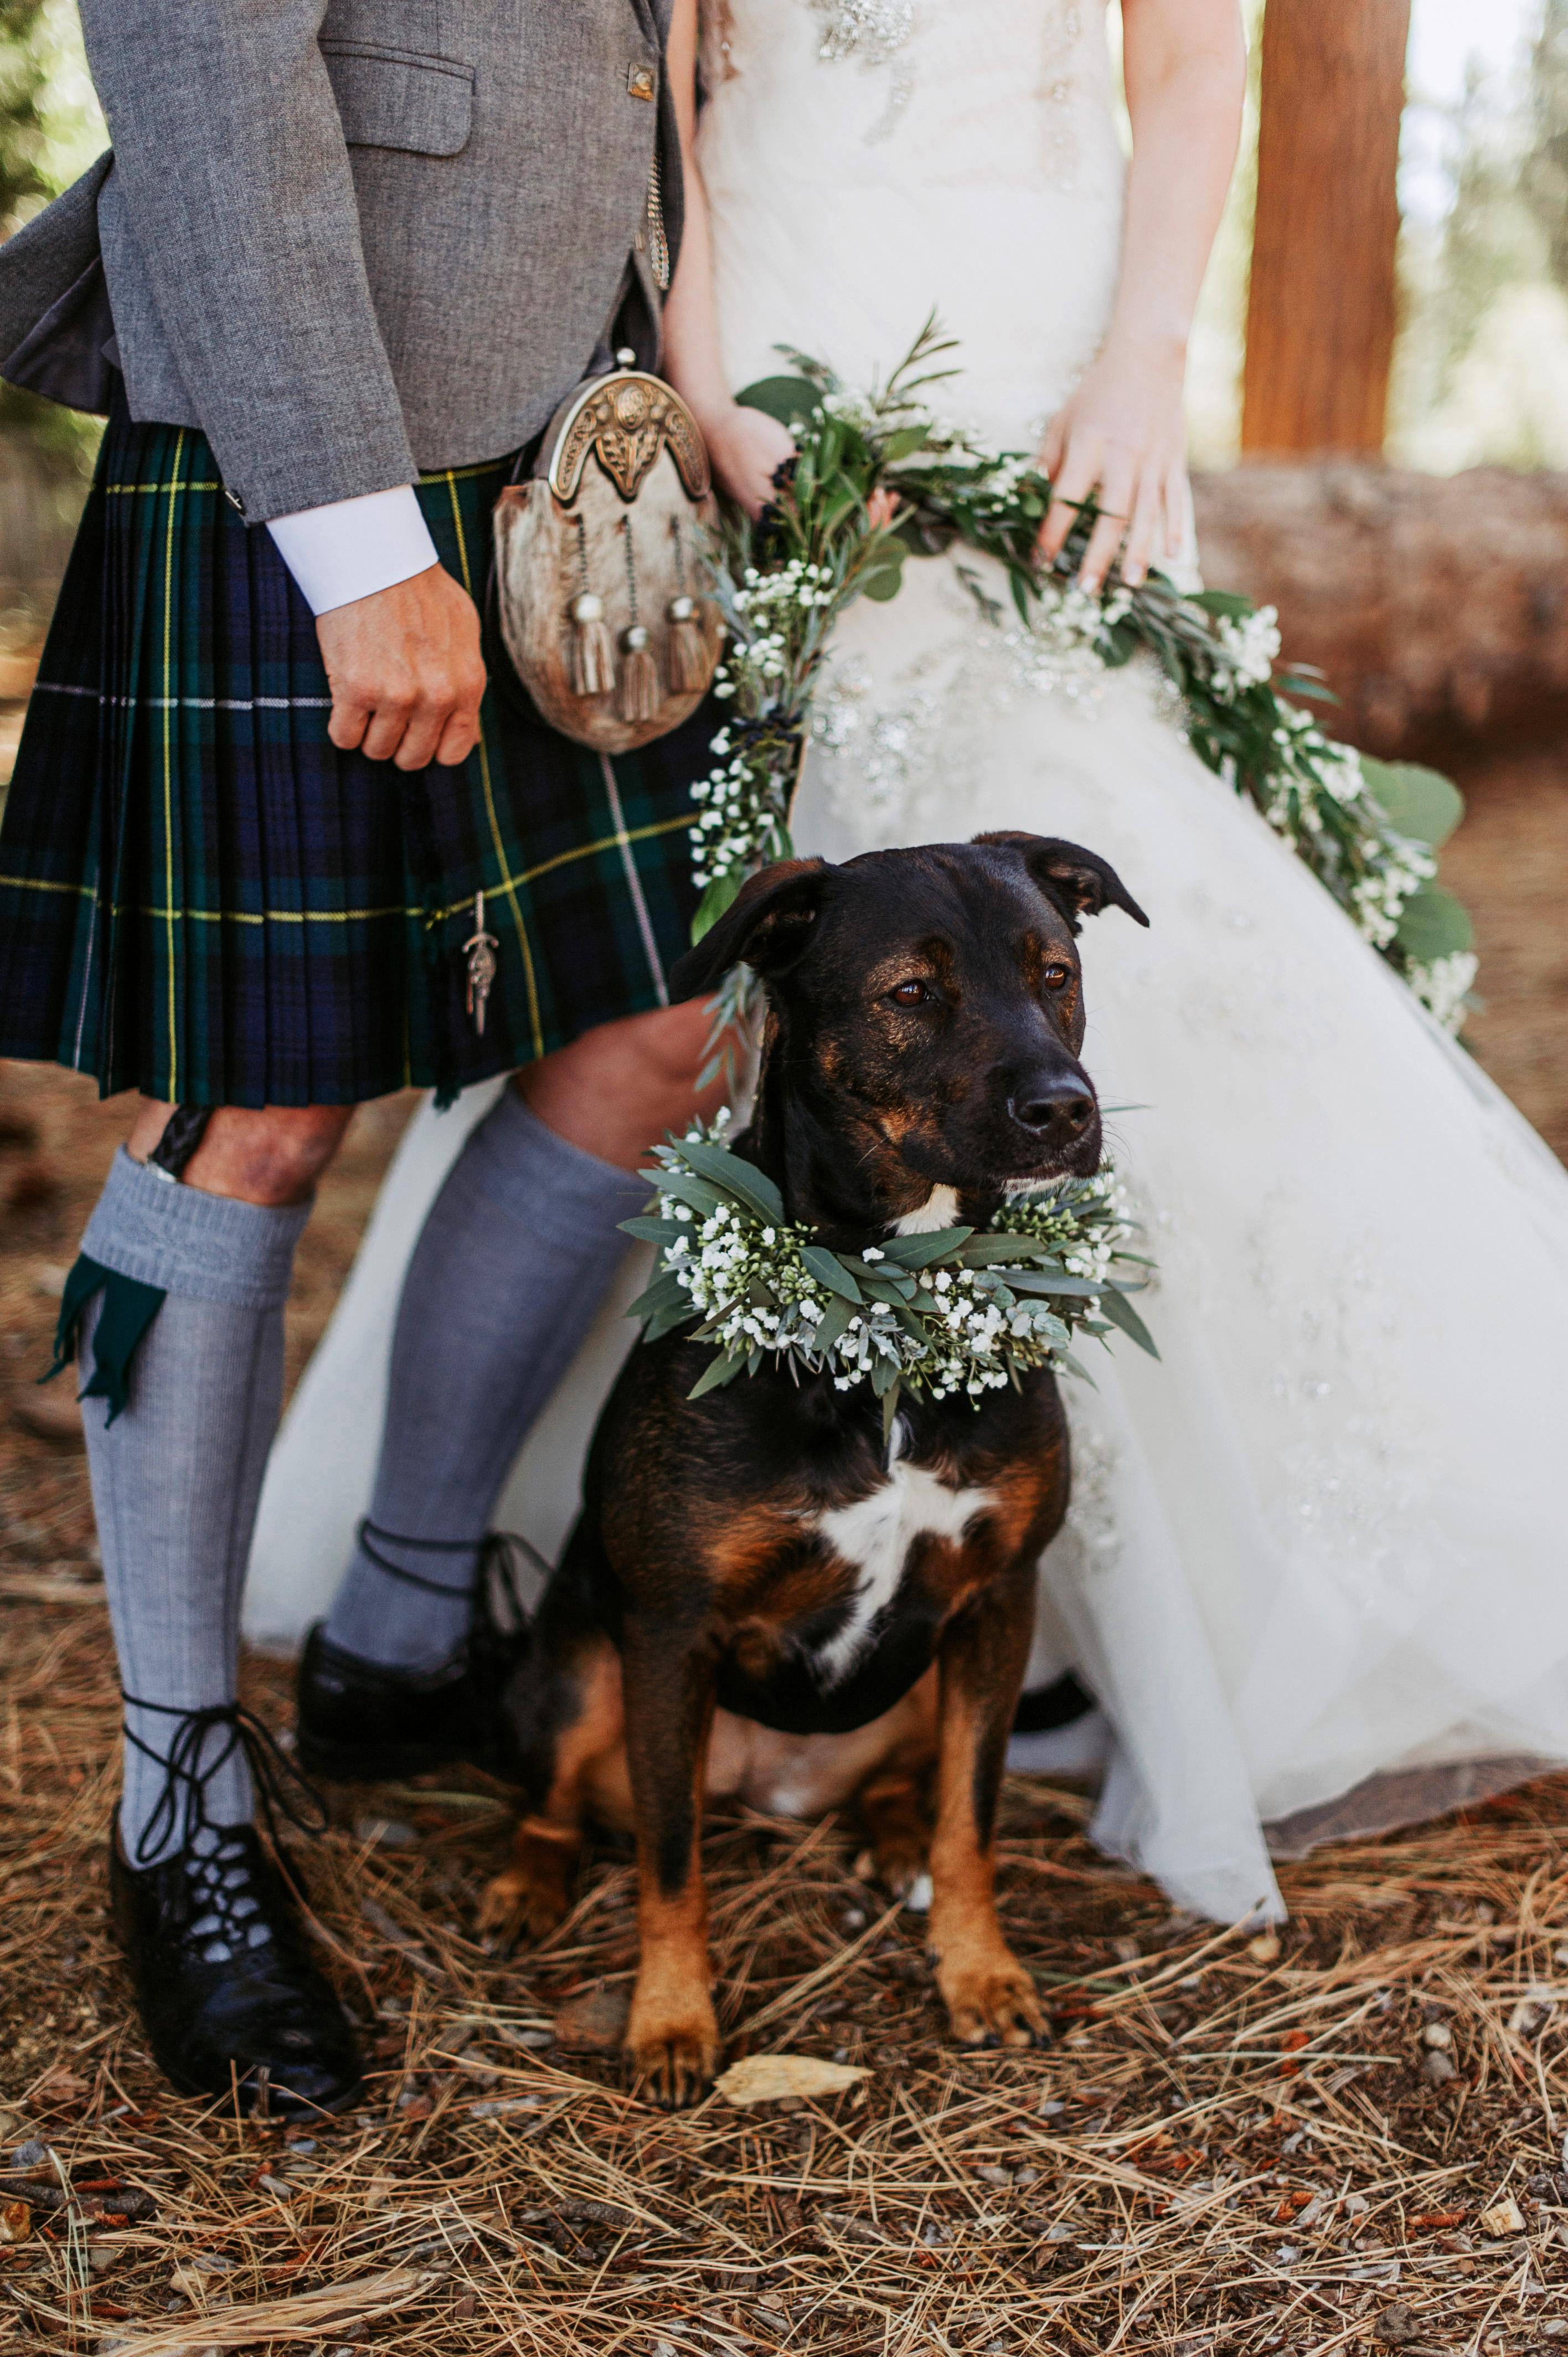 dog wedding bride groom couple feet garland collar